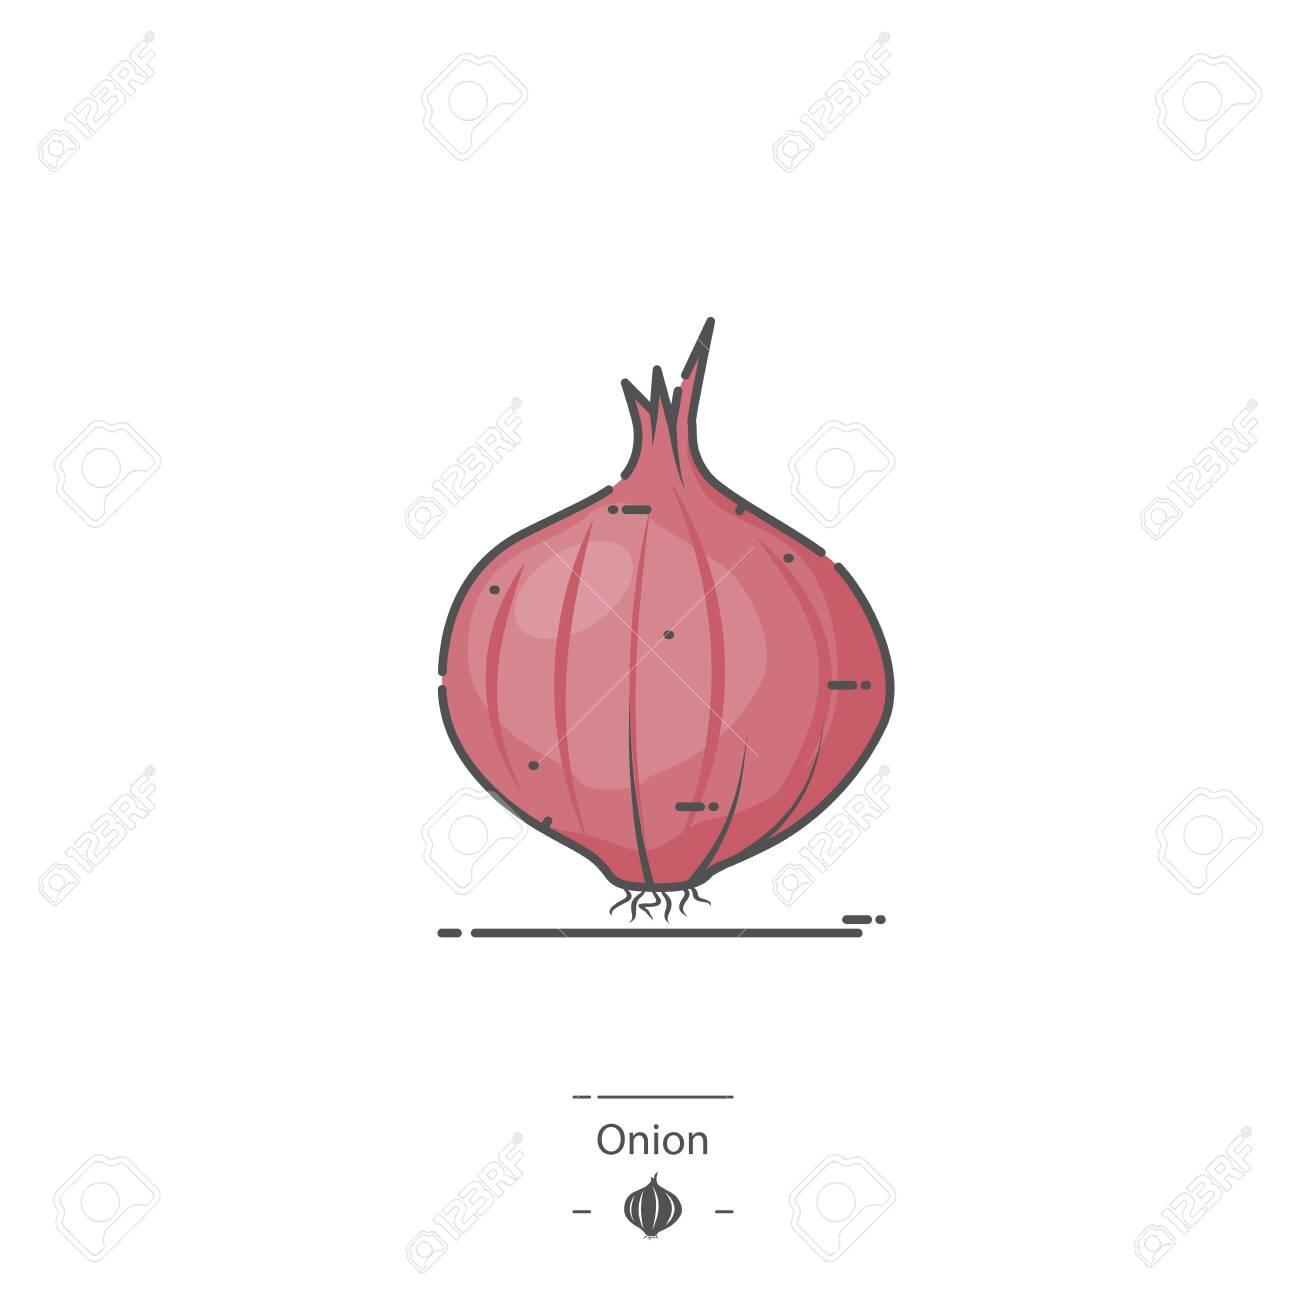 Onion - Line color icon - 126180362